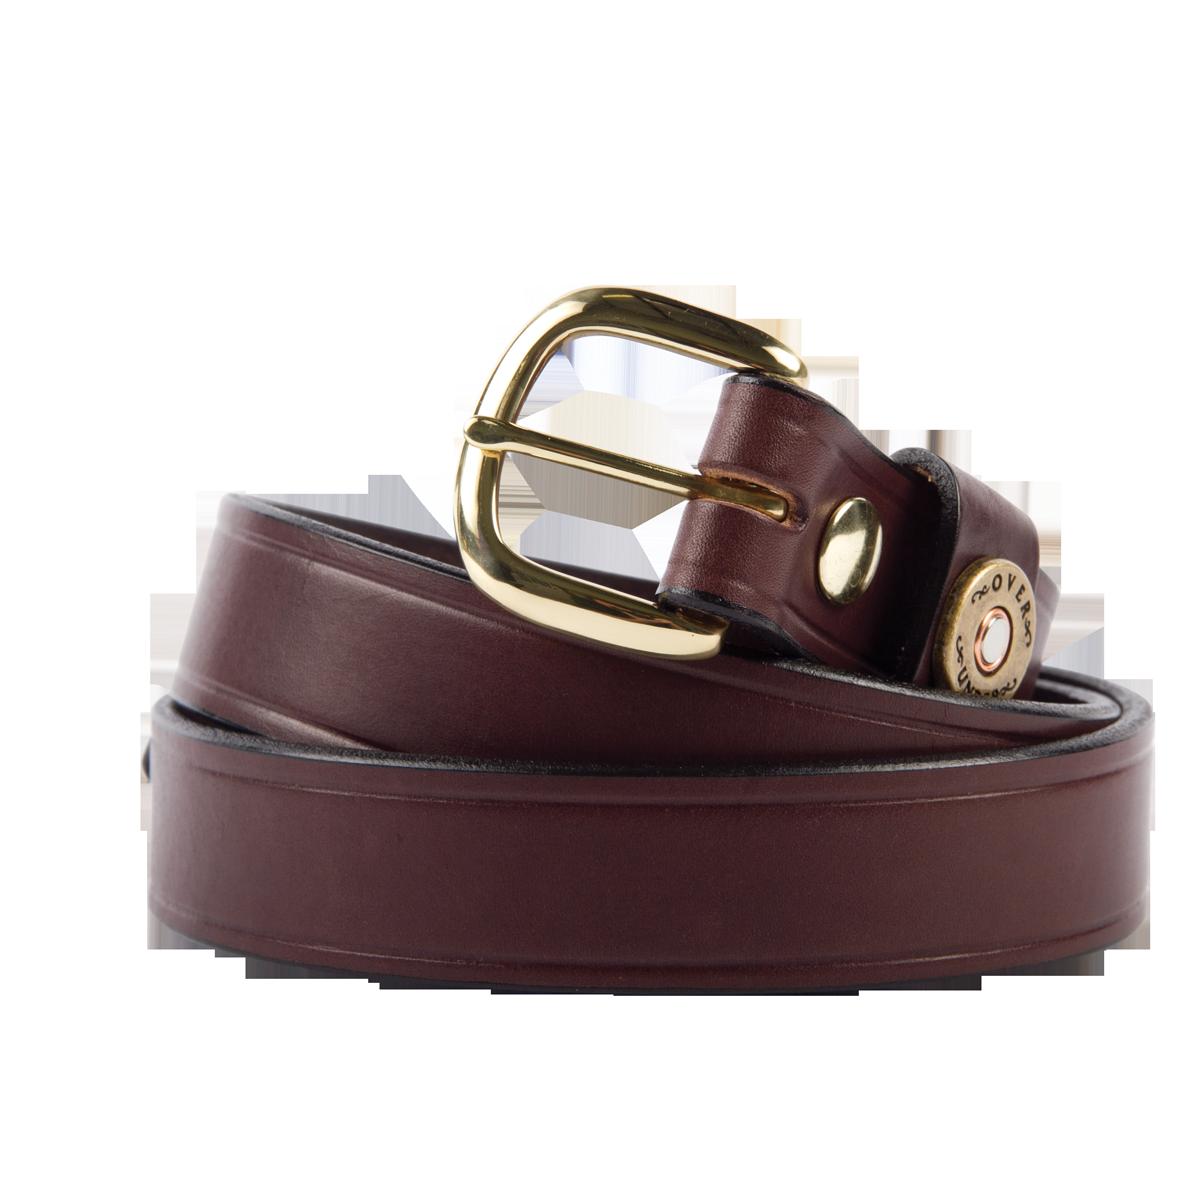 Belt clipart gents. Png images free download